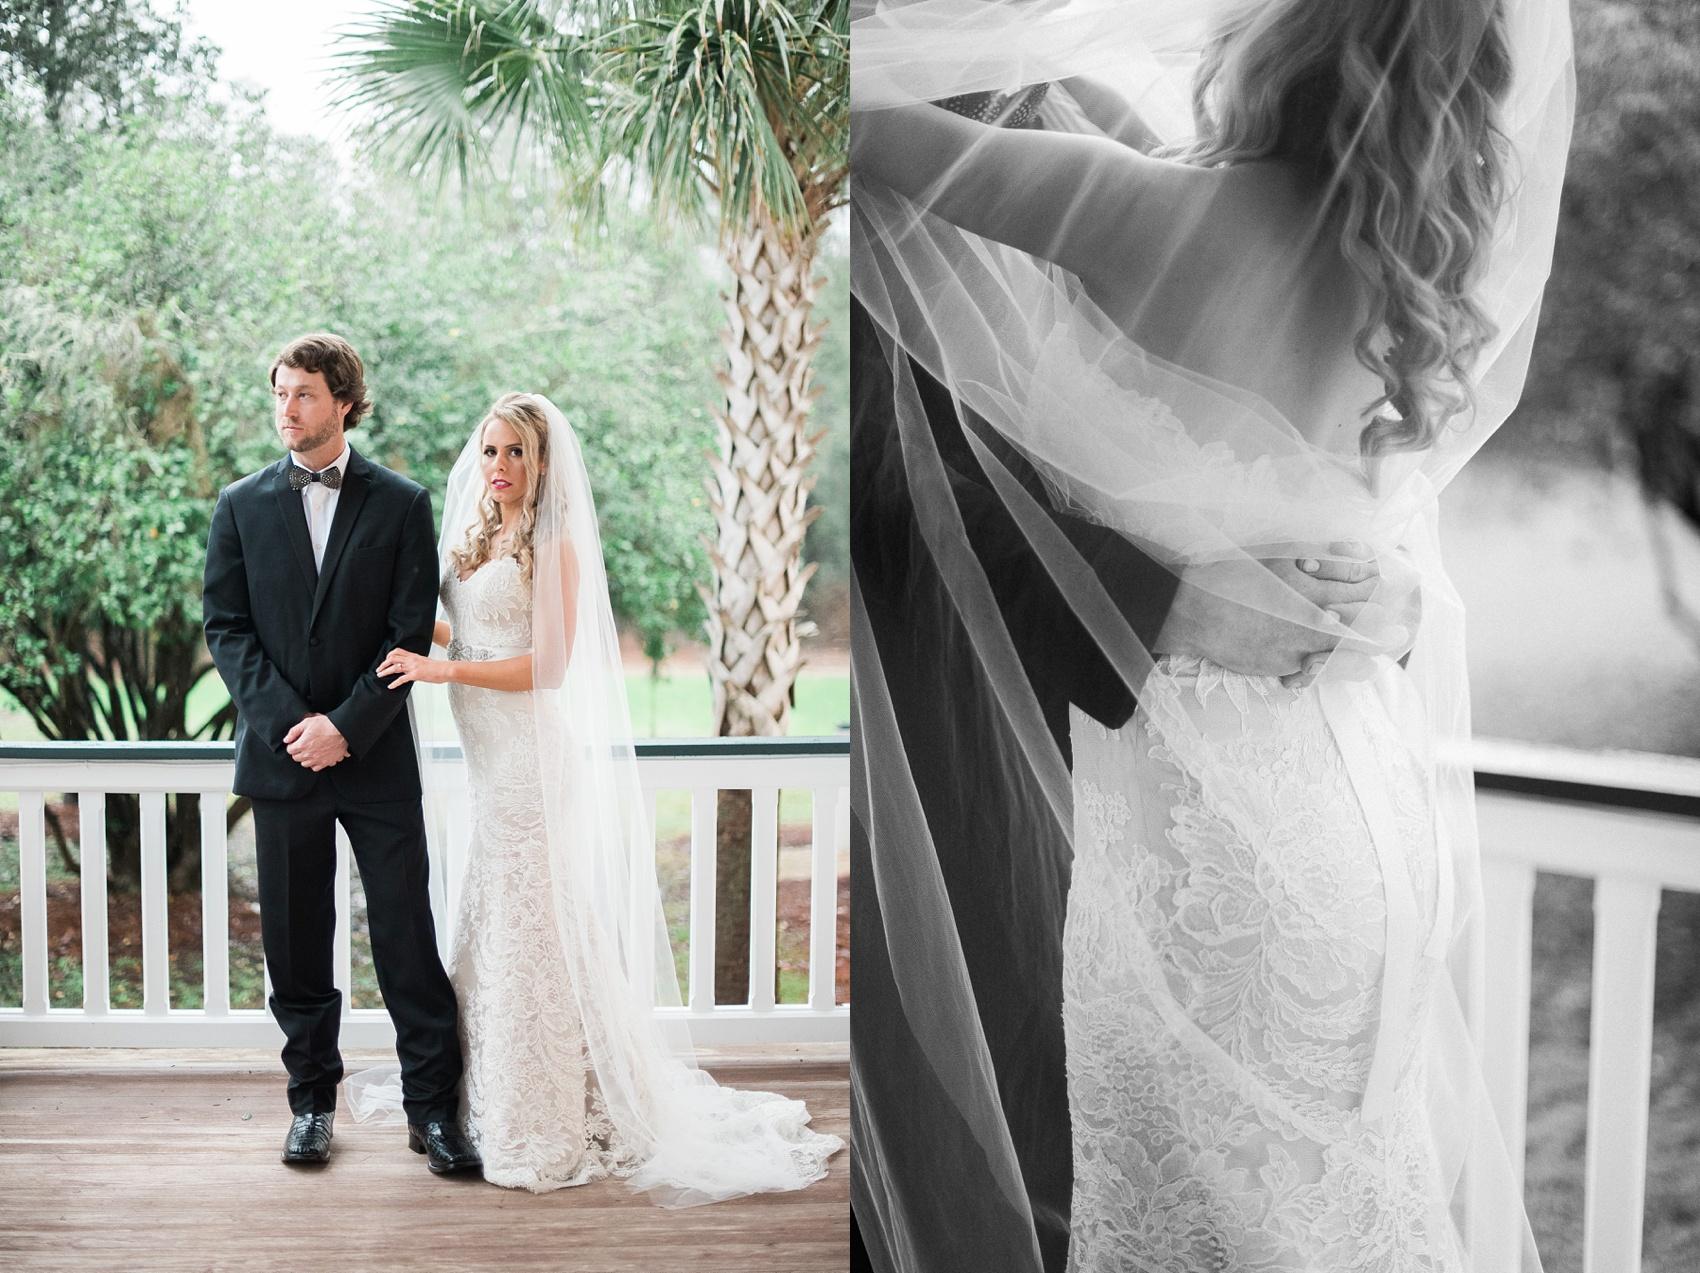 South_carolina_wedding_photographer_0059.jpg